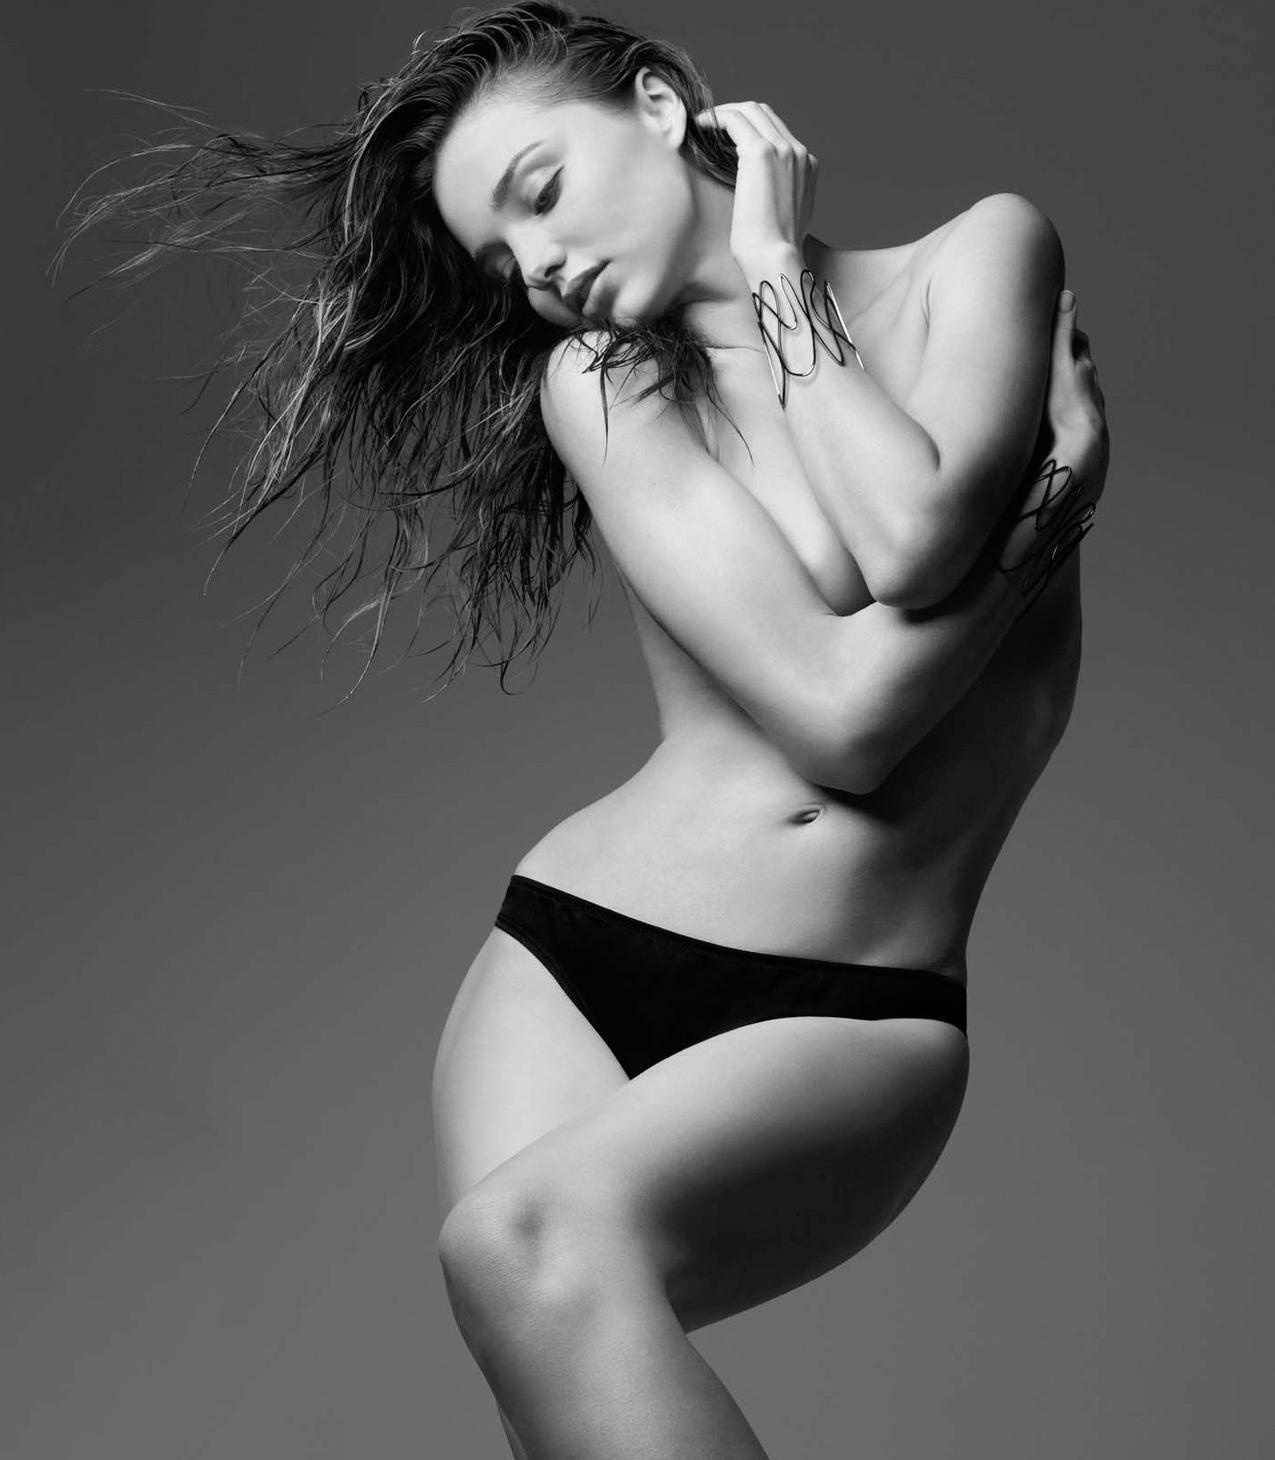 Miranda Kerr Hot Photo Session 4